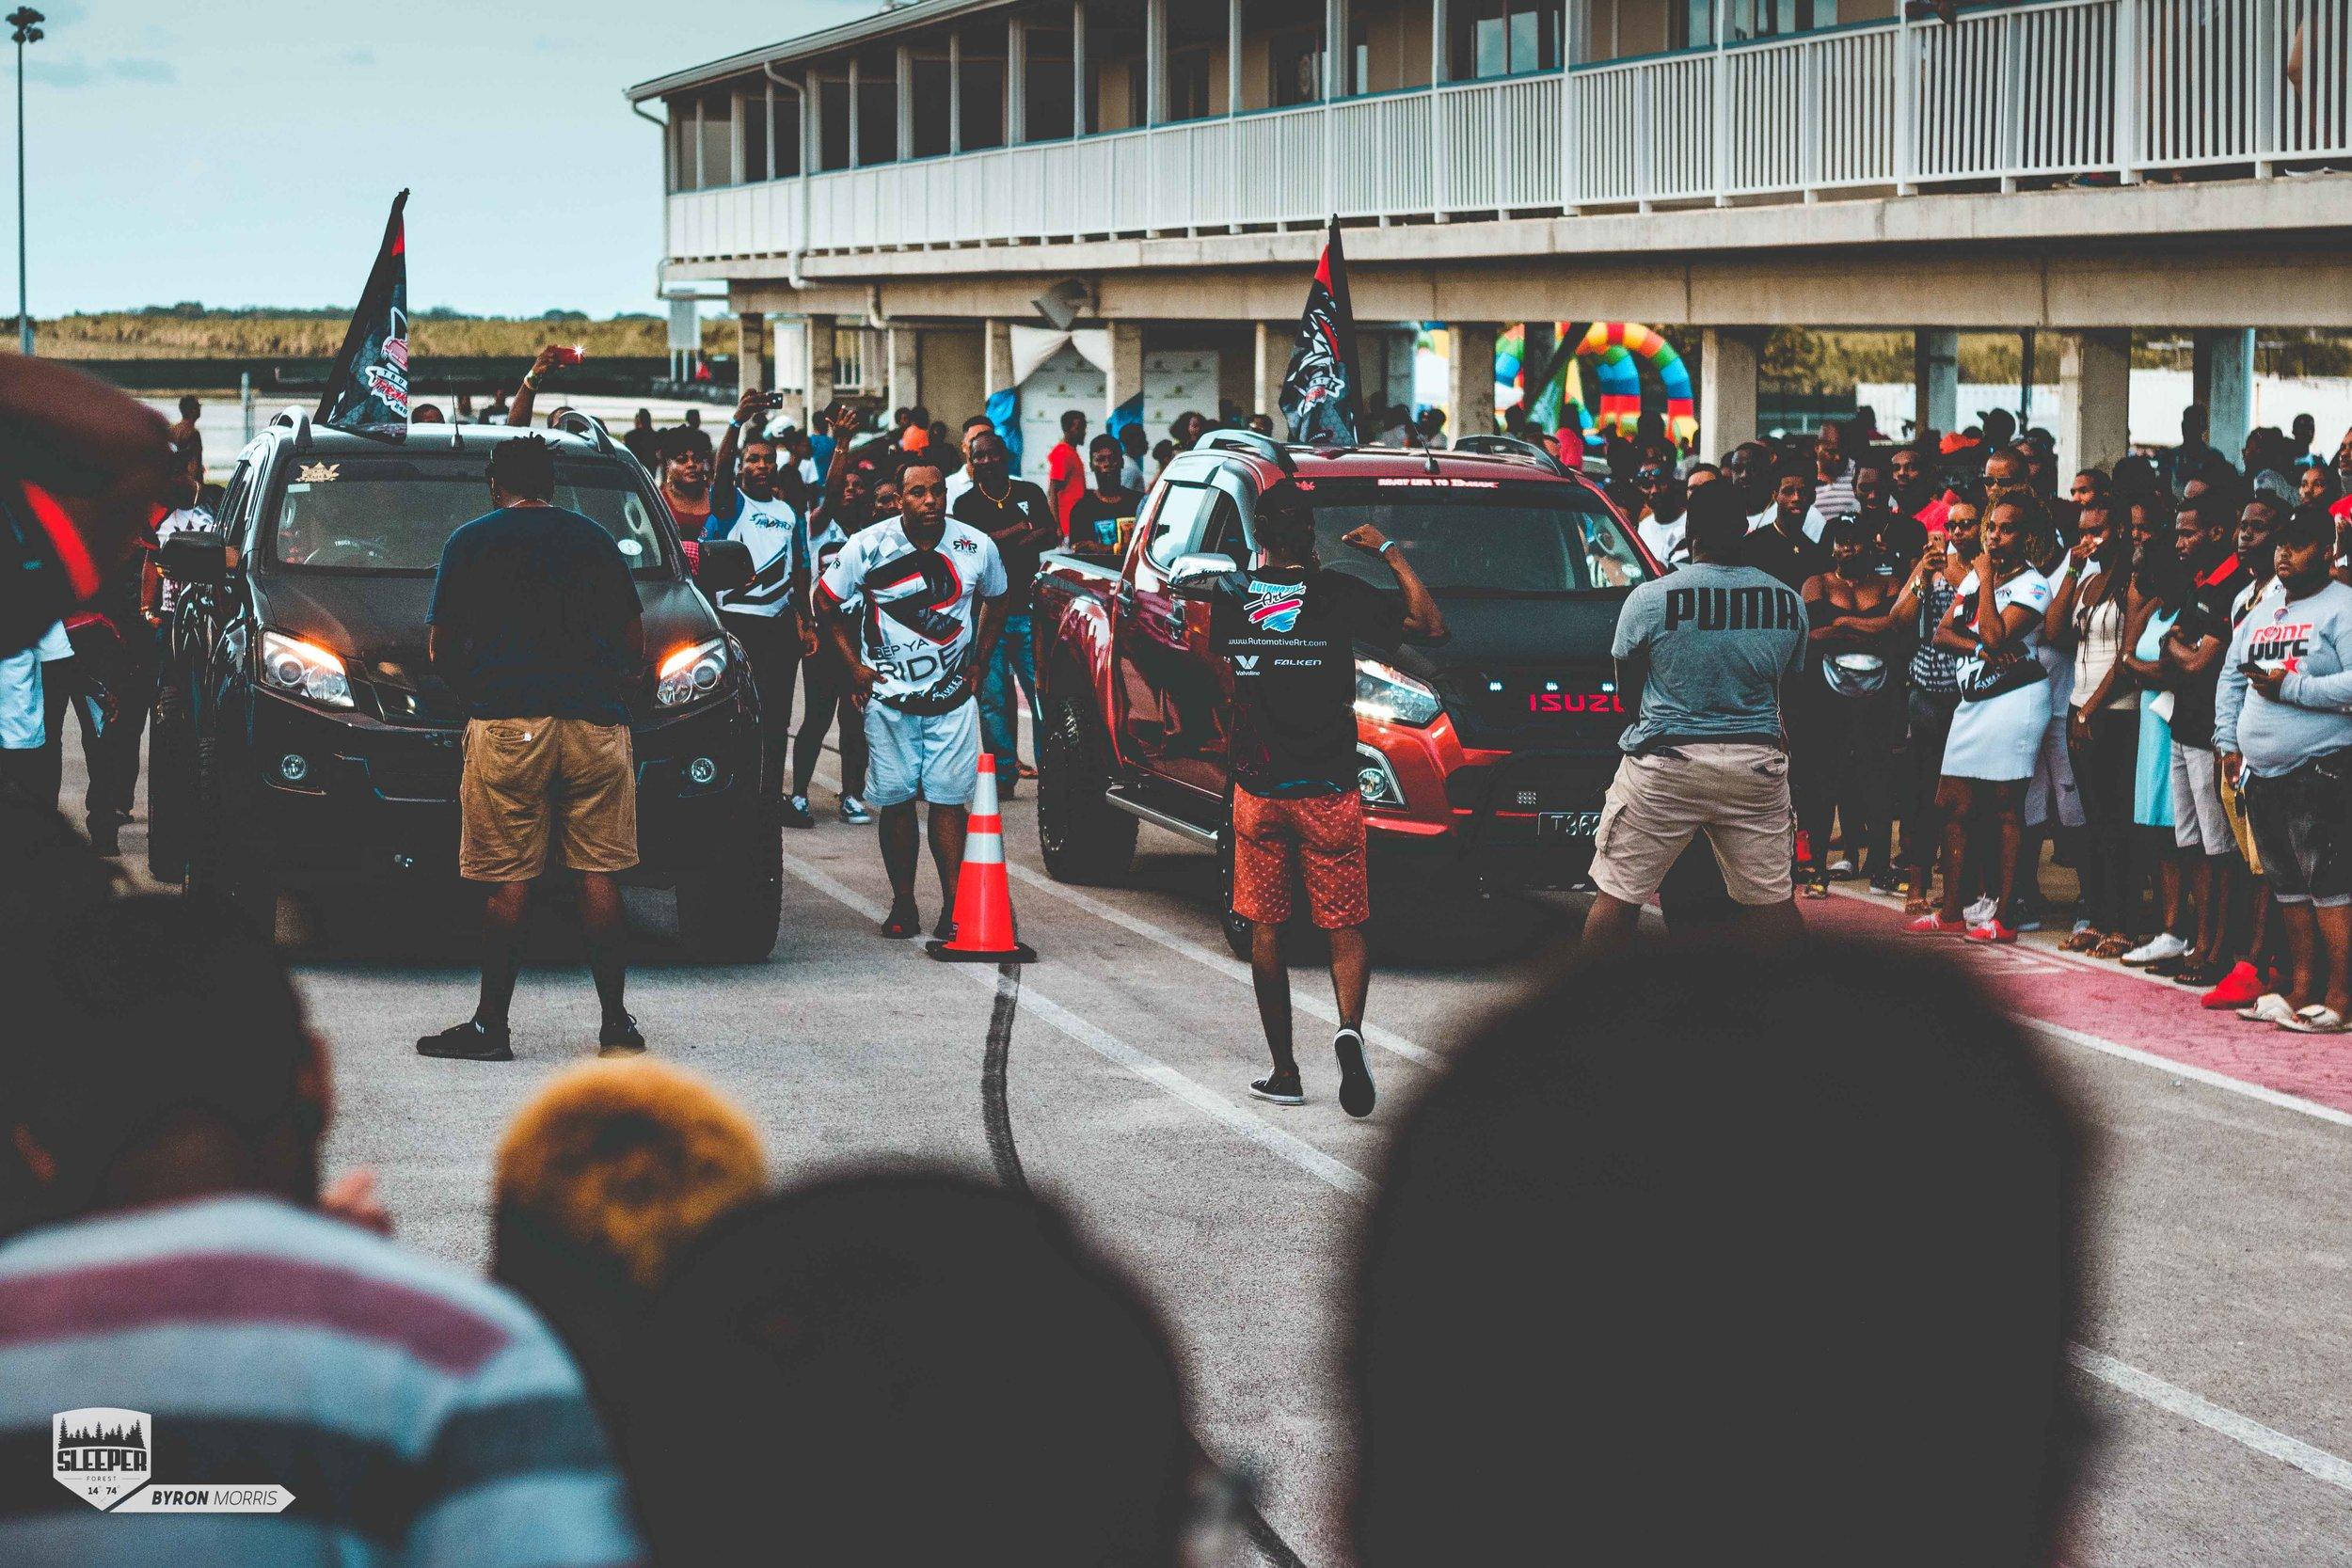 Rep_ya_ride_2019_barbados_car_culture-22.jpg